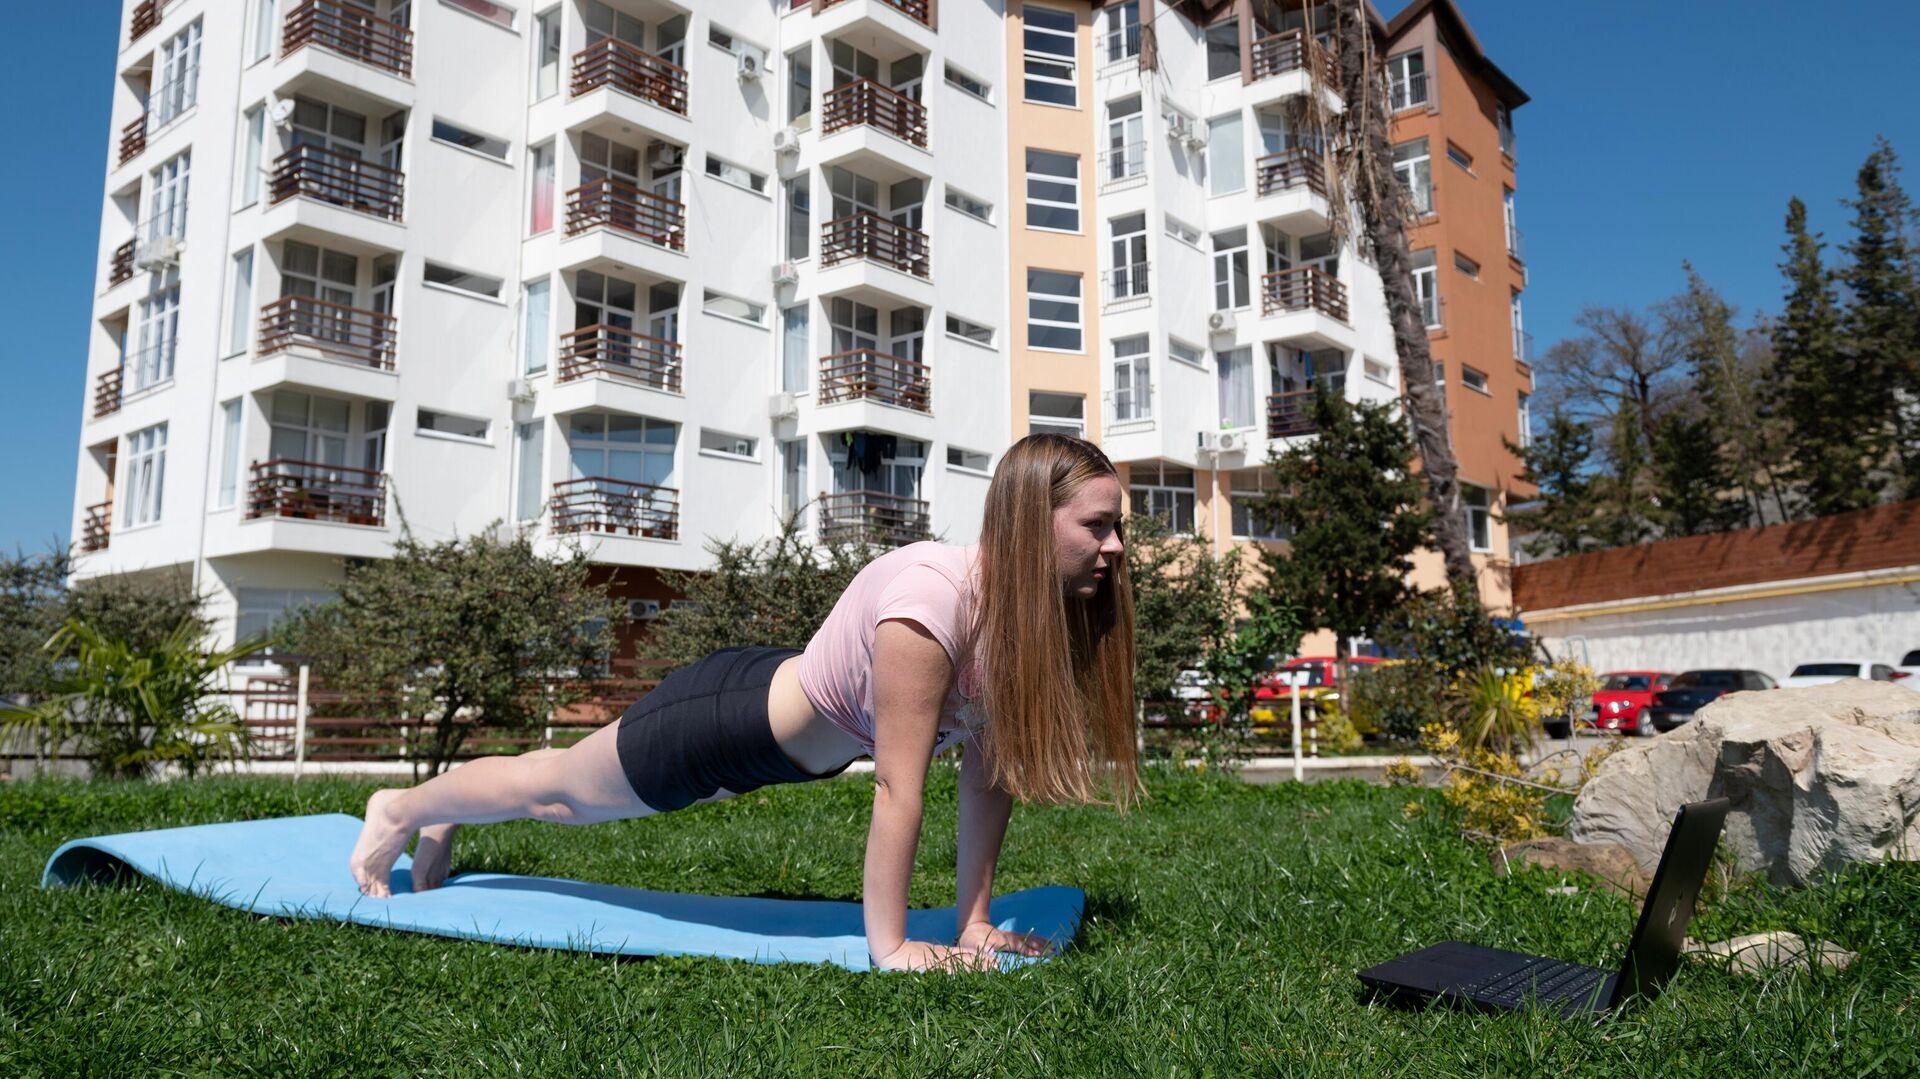 Йога-онлайн для незрячих людей: спорт без границ - РИА Новости, 1920, 25.08.2020